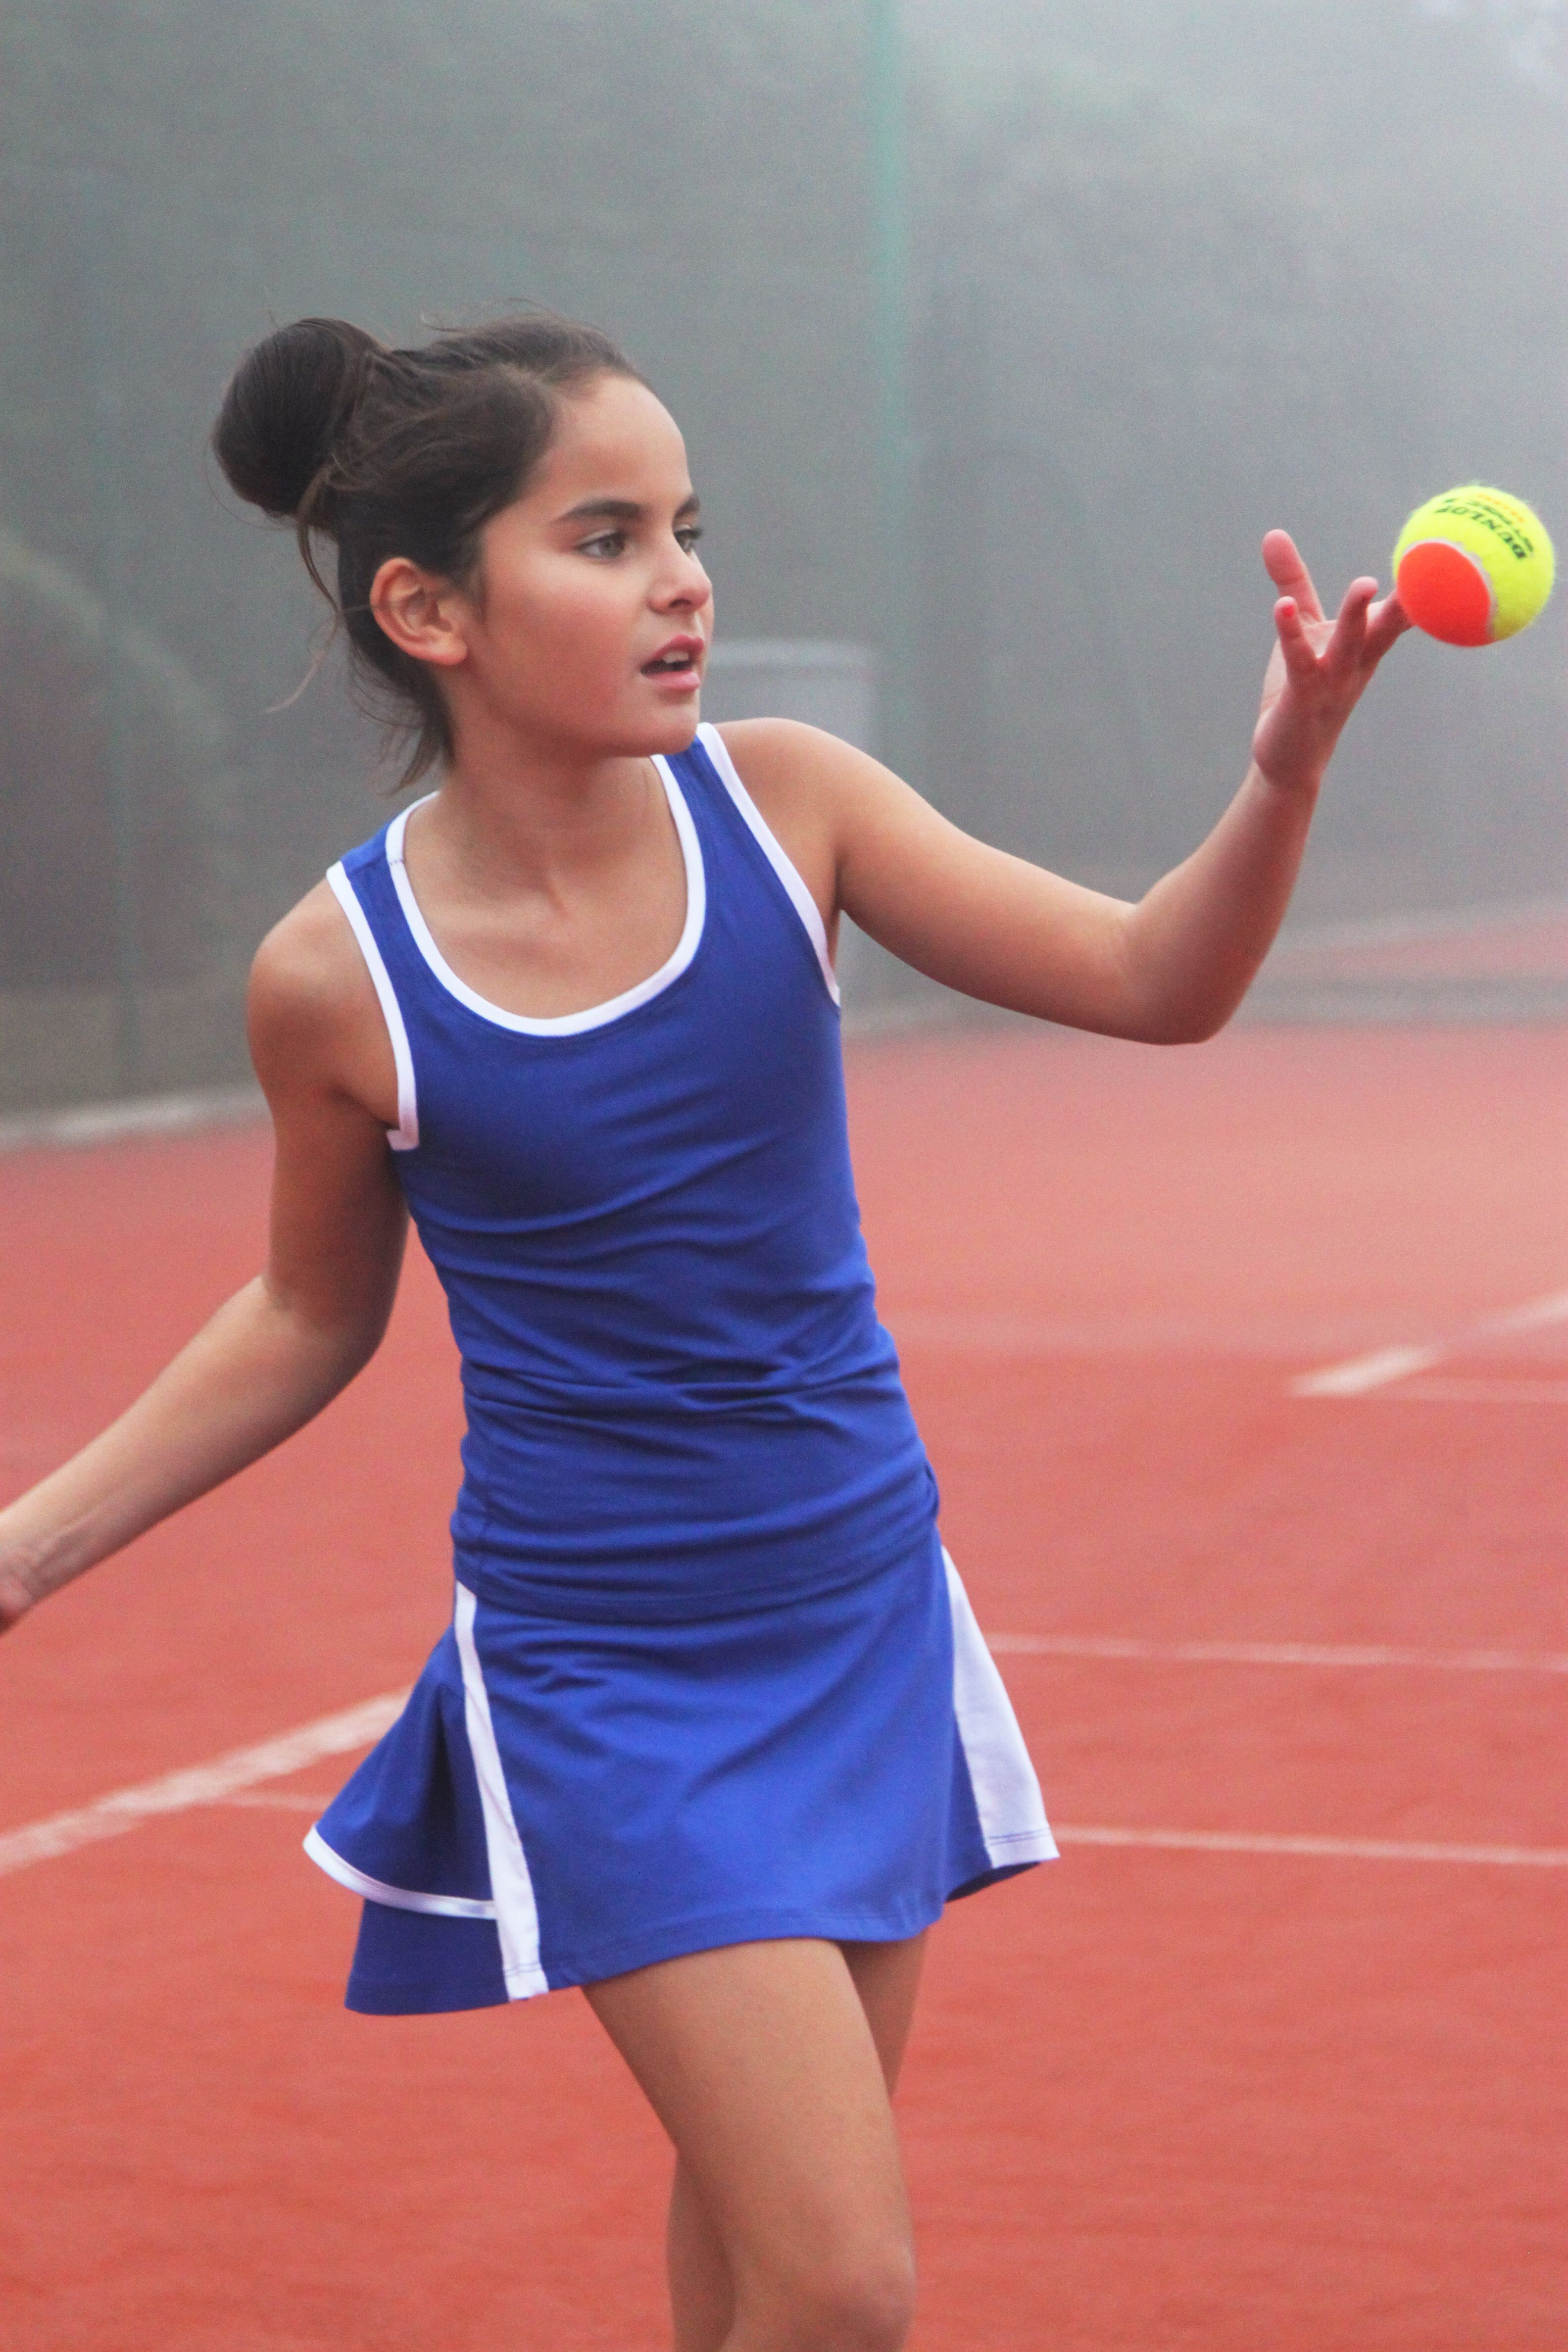 64c408ccba6dd7 Angelique Cobalt Blue Tennis Outfit designed and made in UK by Zoe  Alexander UK. #Tennis #KidsFashion #TennisApparel #TennisSkirt